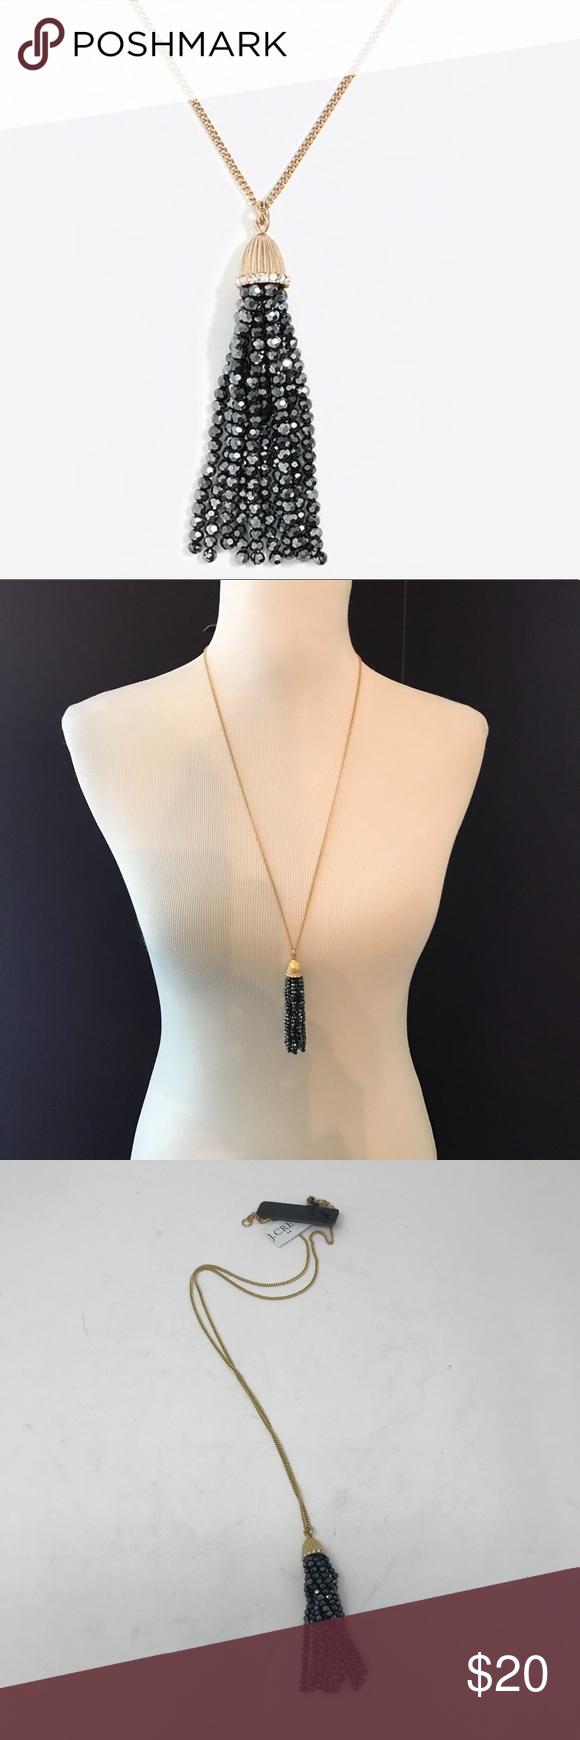 Nwt j crew tassle beaded pendant necklace nwt steel chain